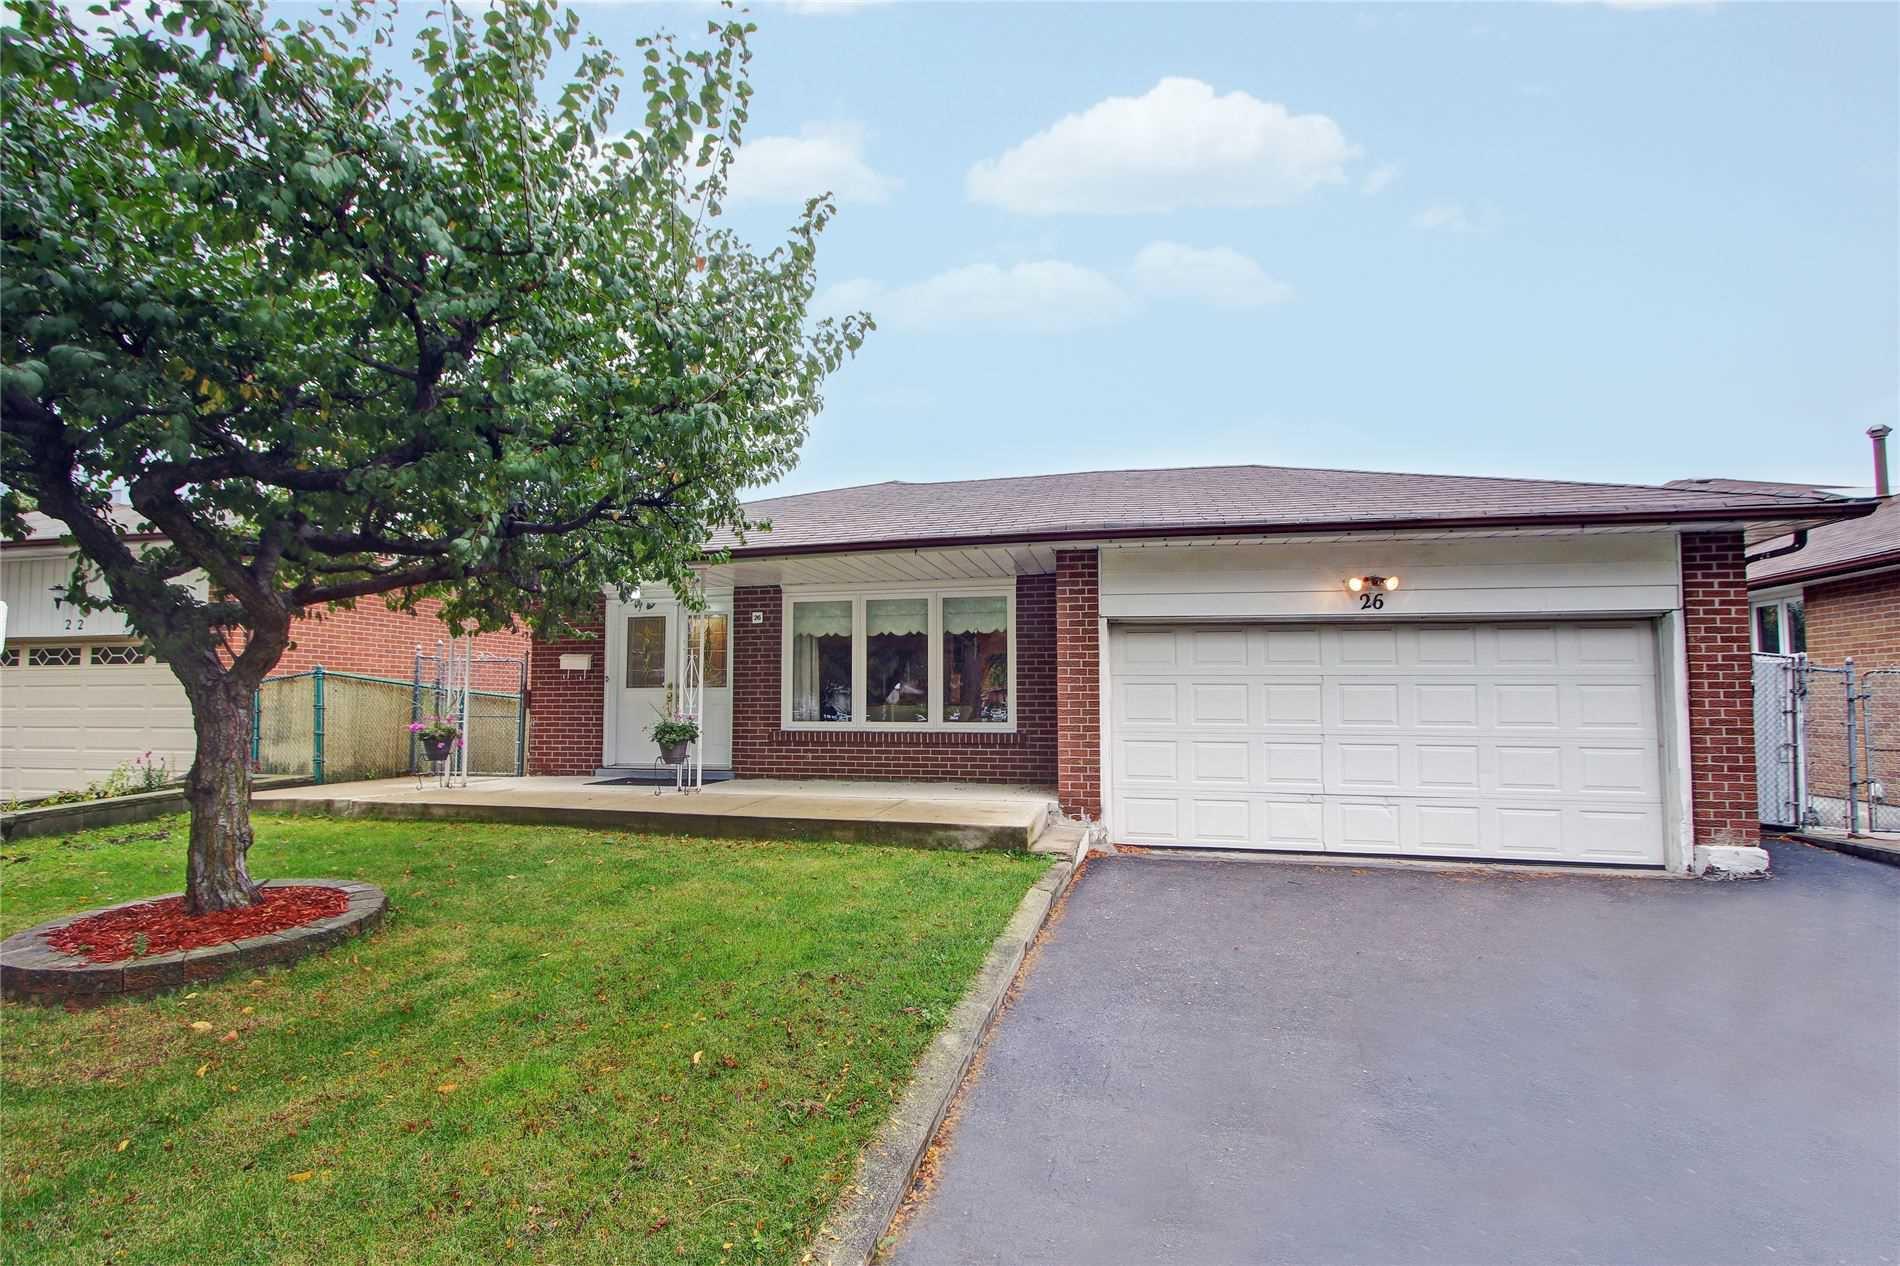 Main Photo: 26 Ladner Drive in Toronto: Pleasant View House (Backsplit 4) for sale (Toronto C15)  : MLS®# C4598547